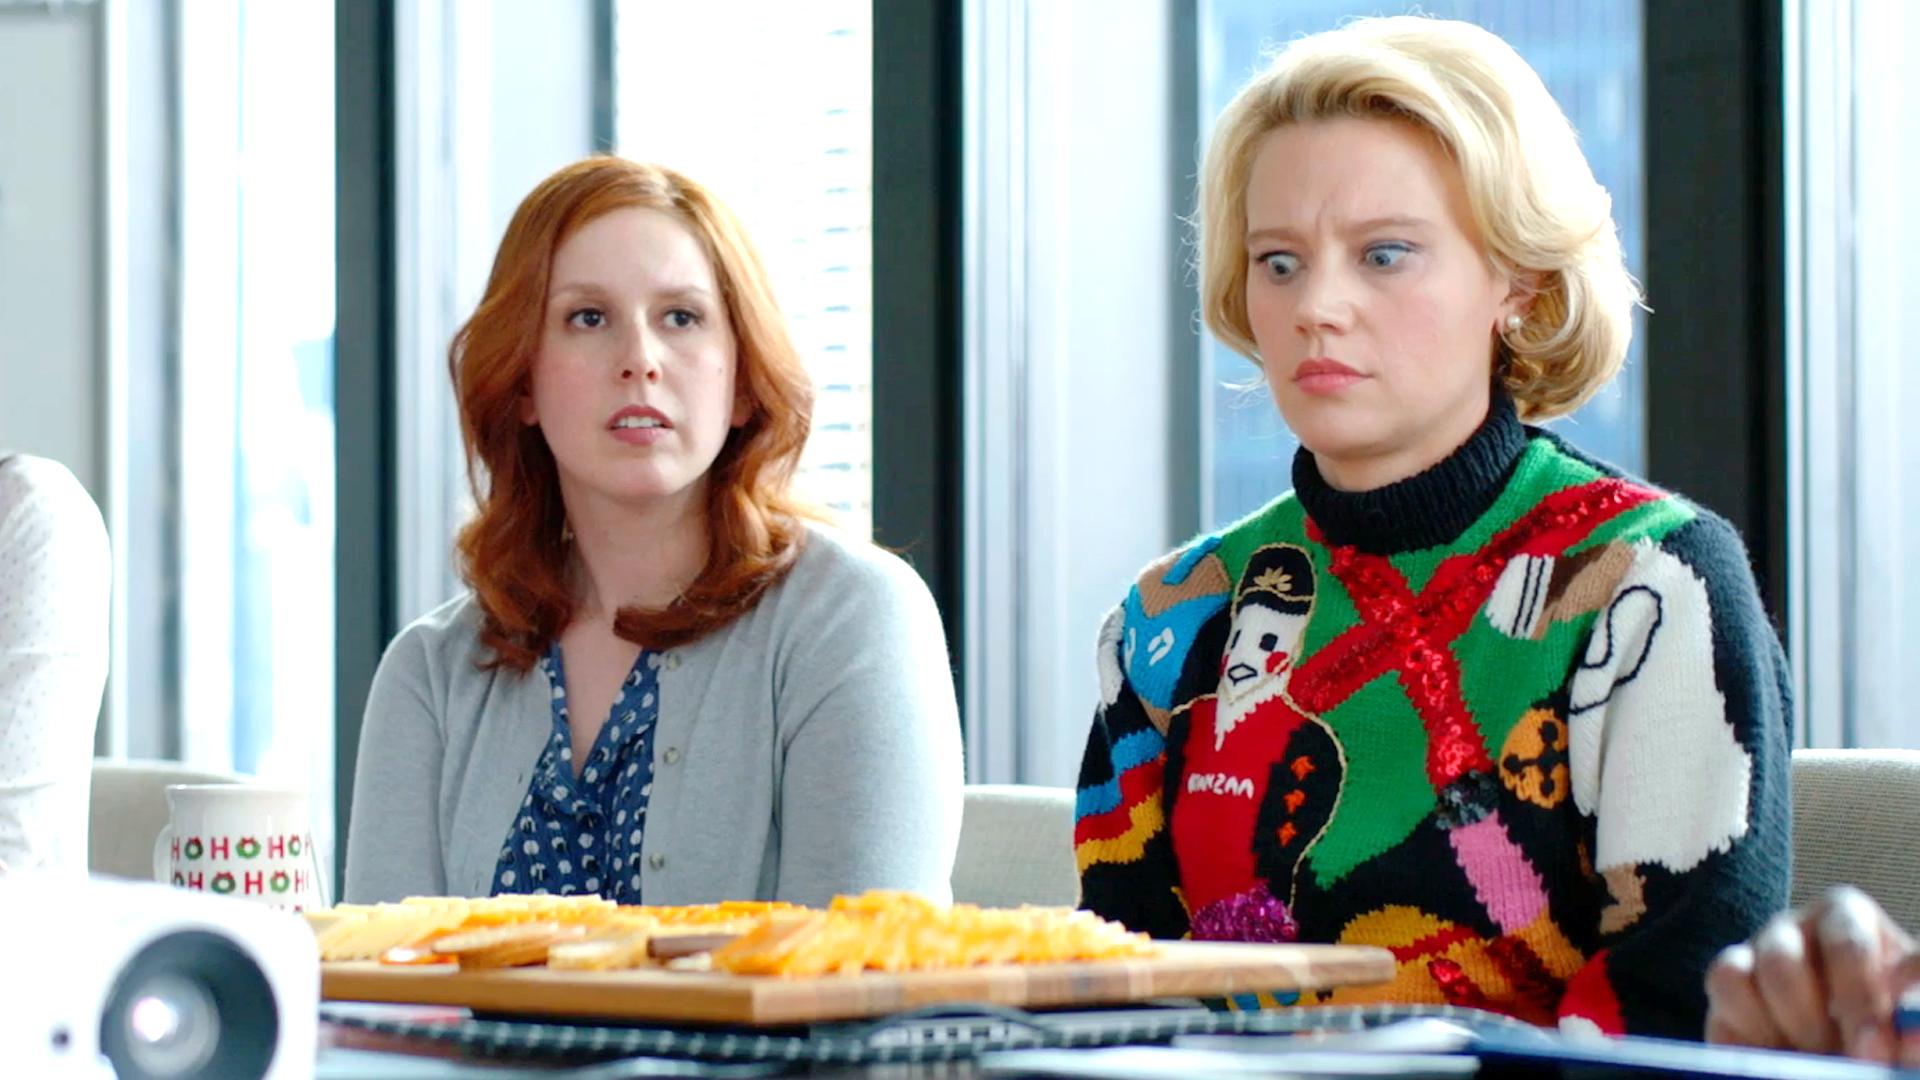 Office Christmas Party: Office Christmas Party Movie Clip - Holiday ...